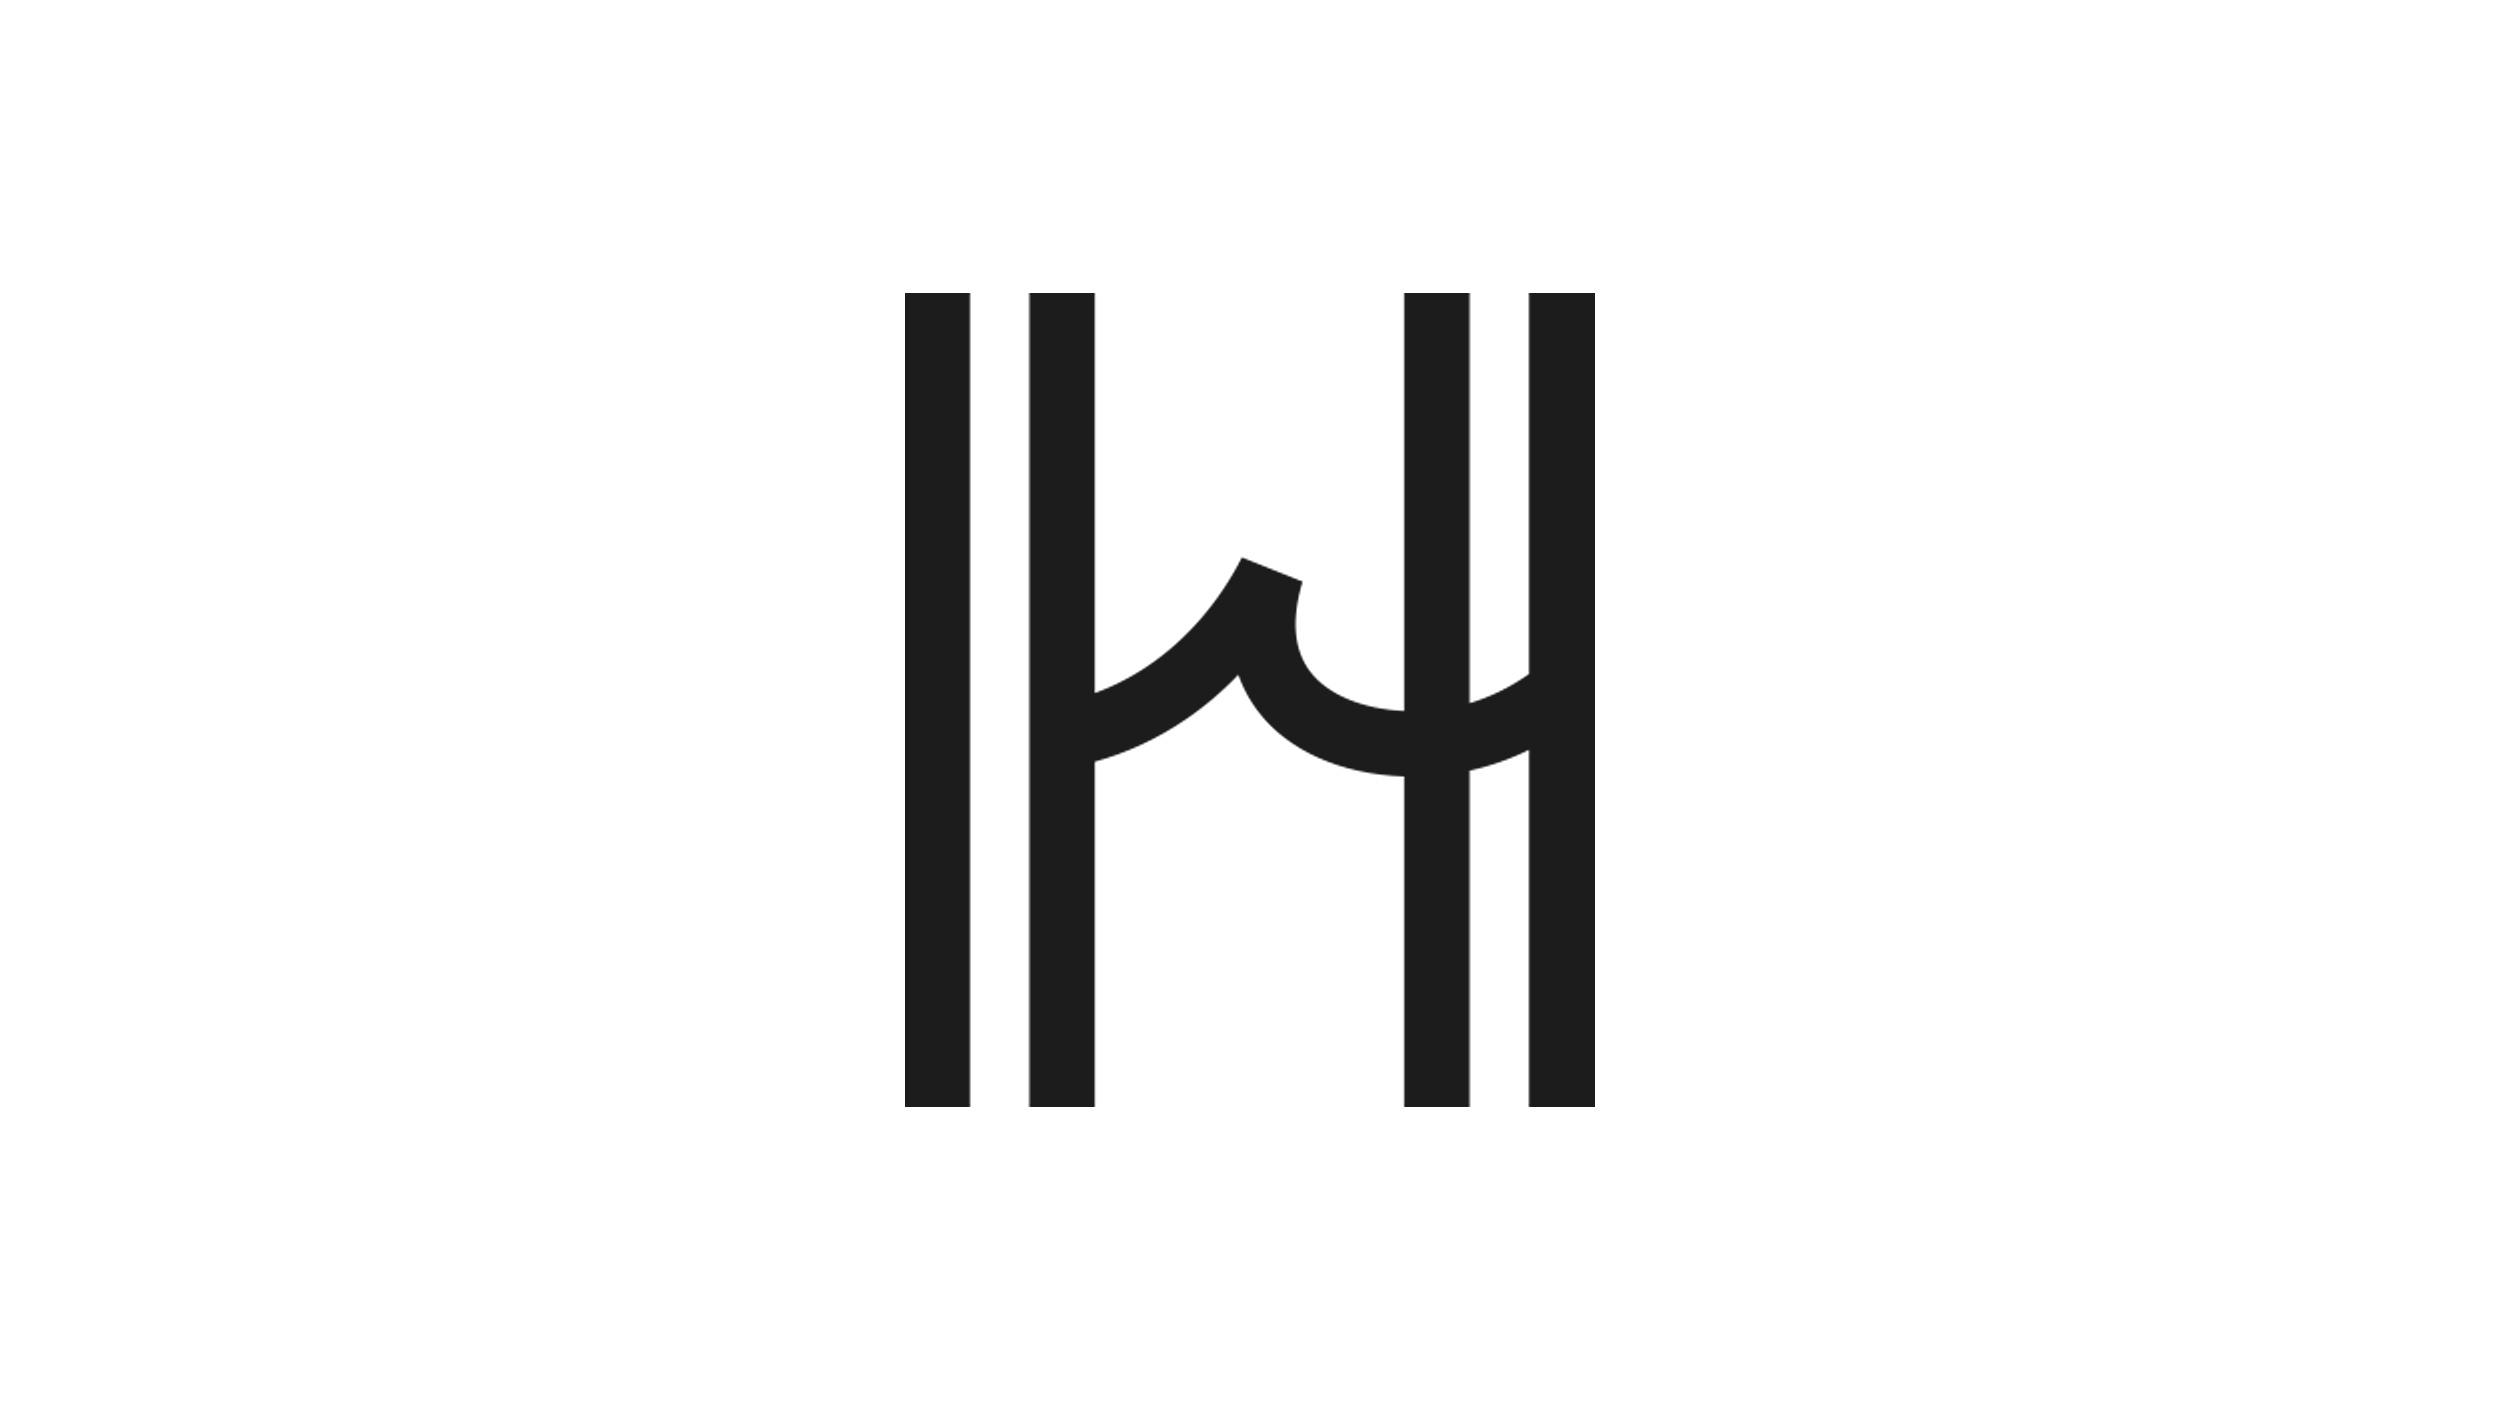 Höllviksnäs – graphic identity